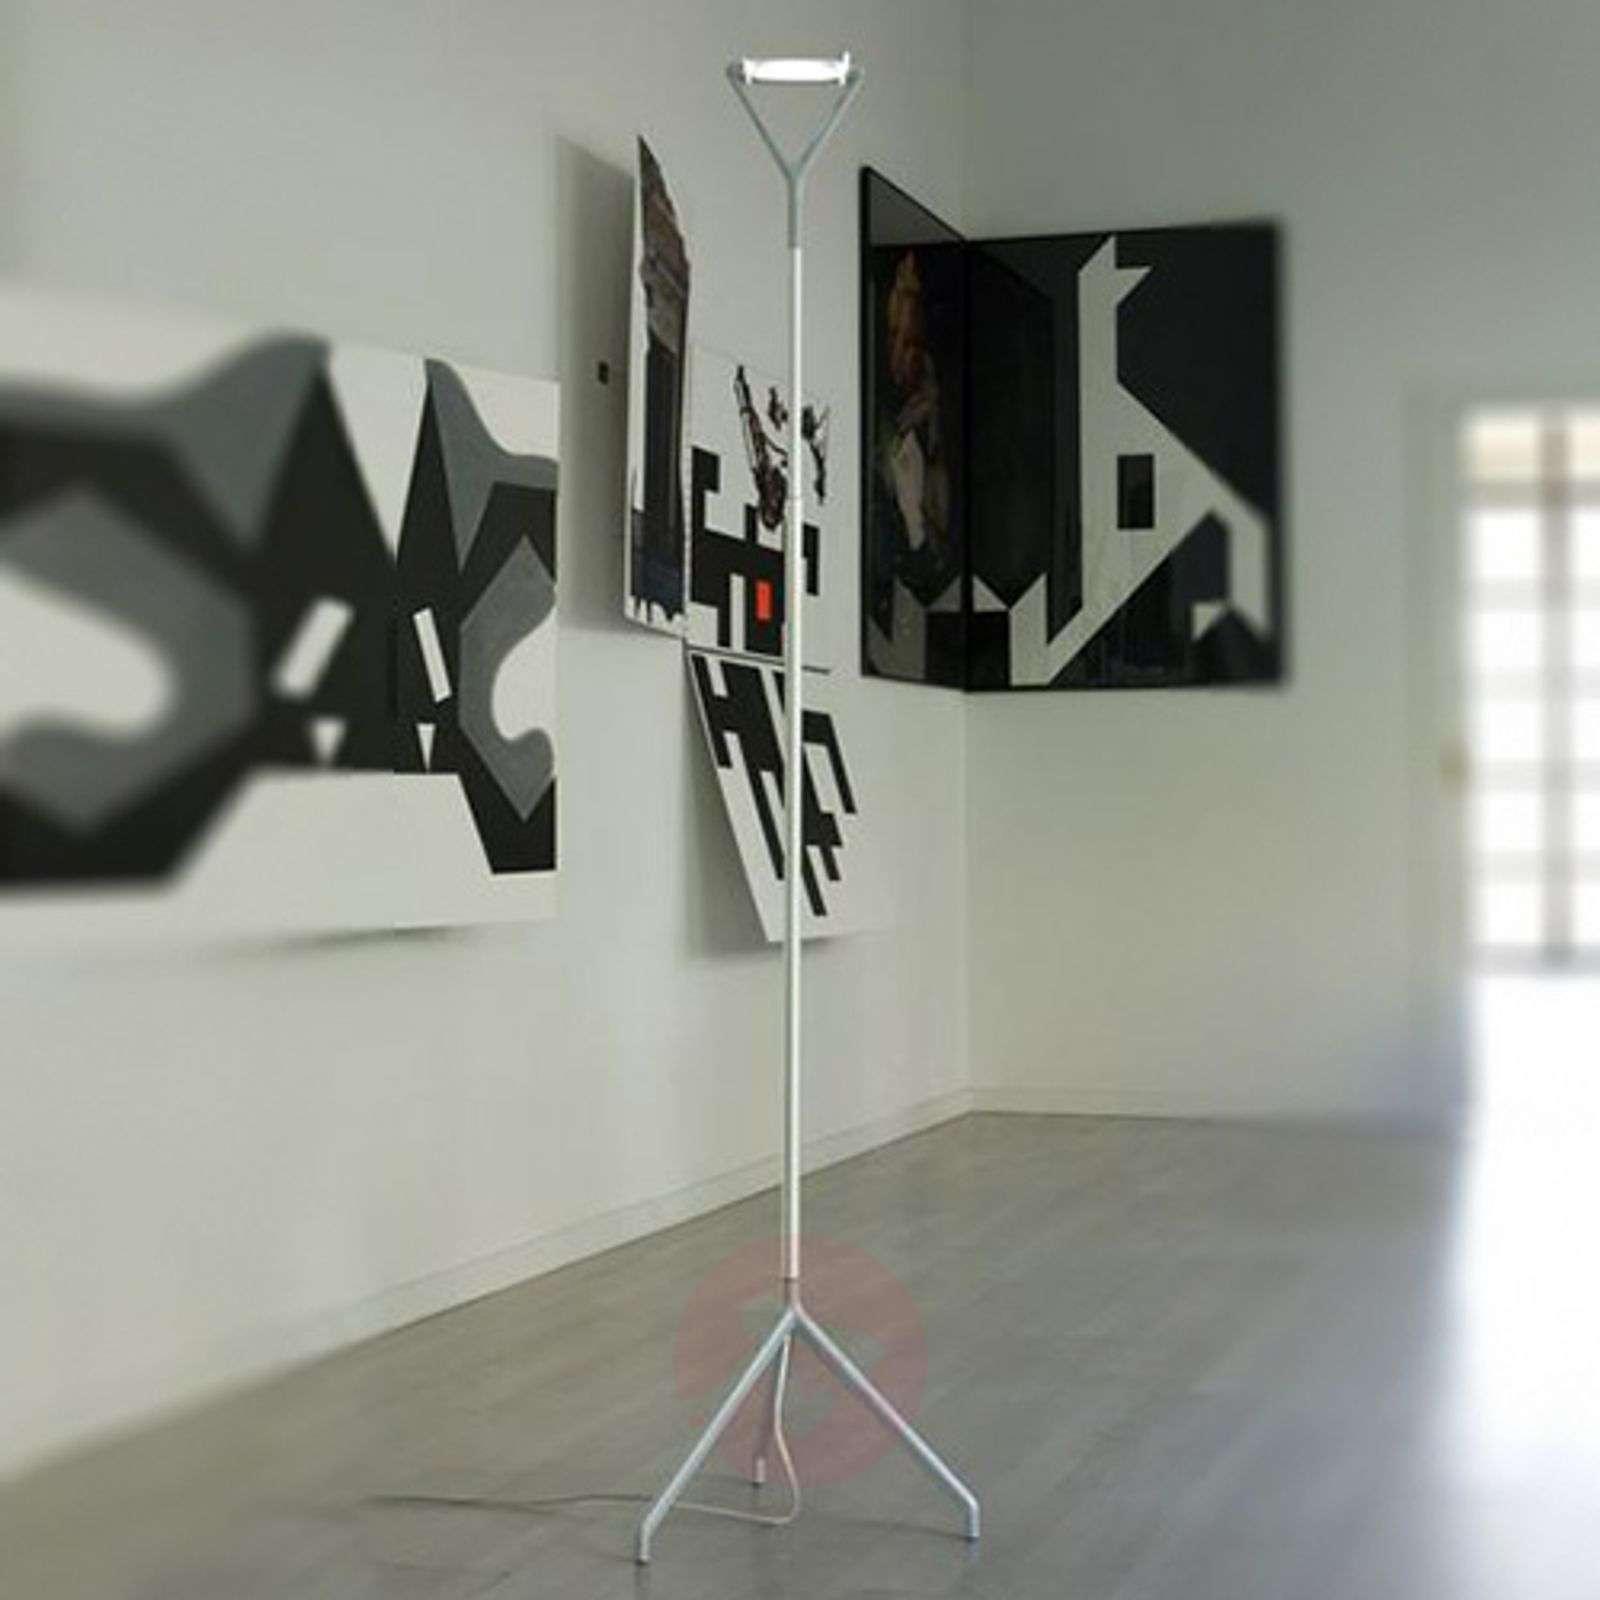 Lola a multifunctional floor lamp-6030020-01